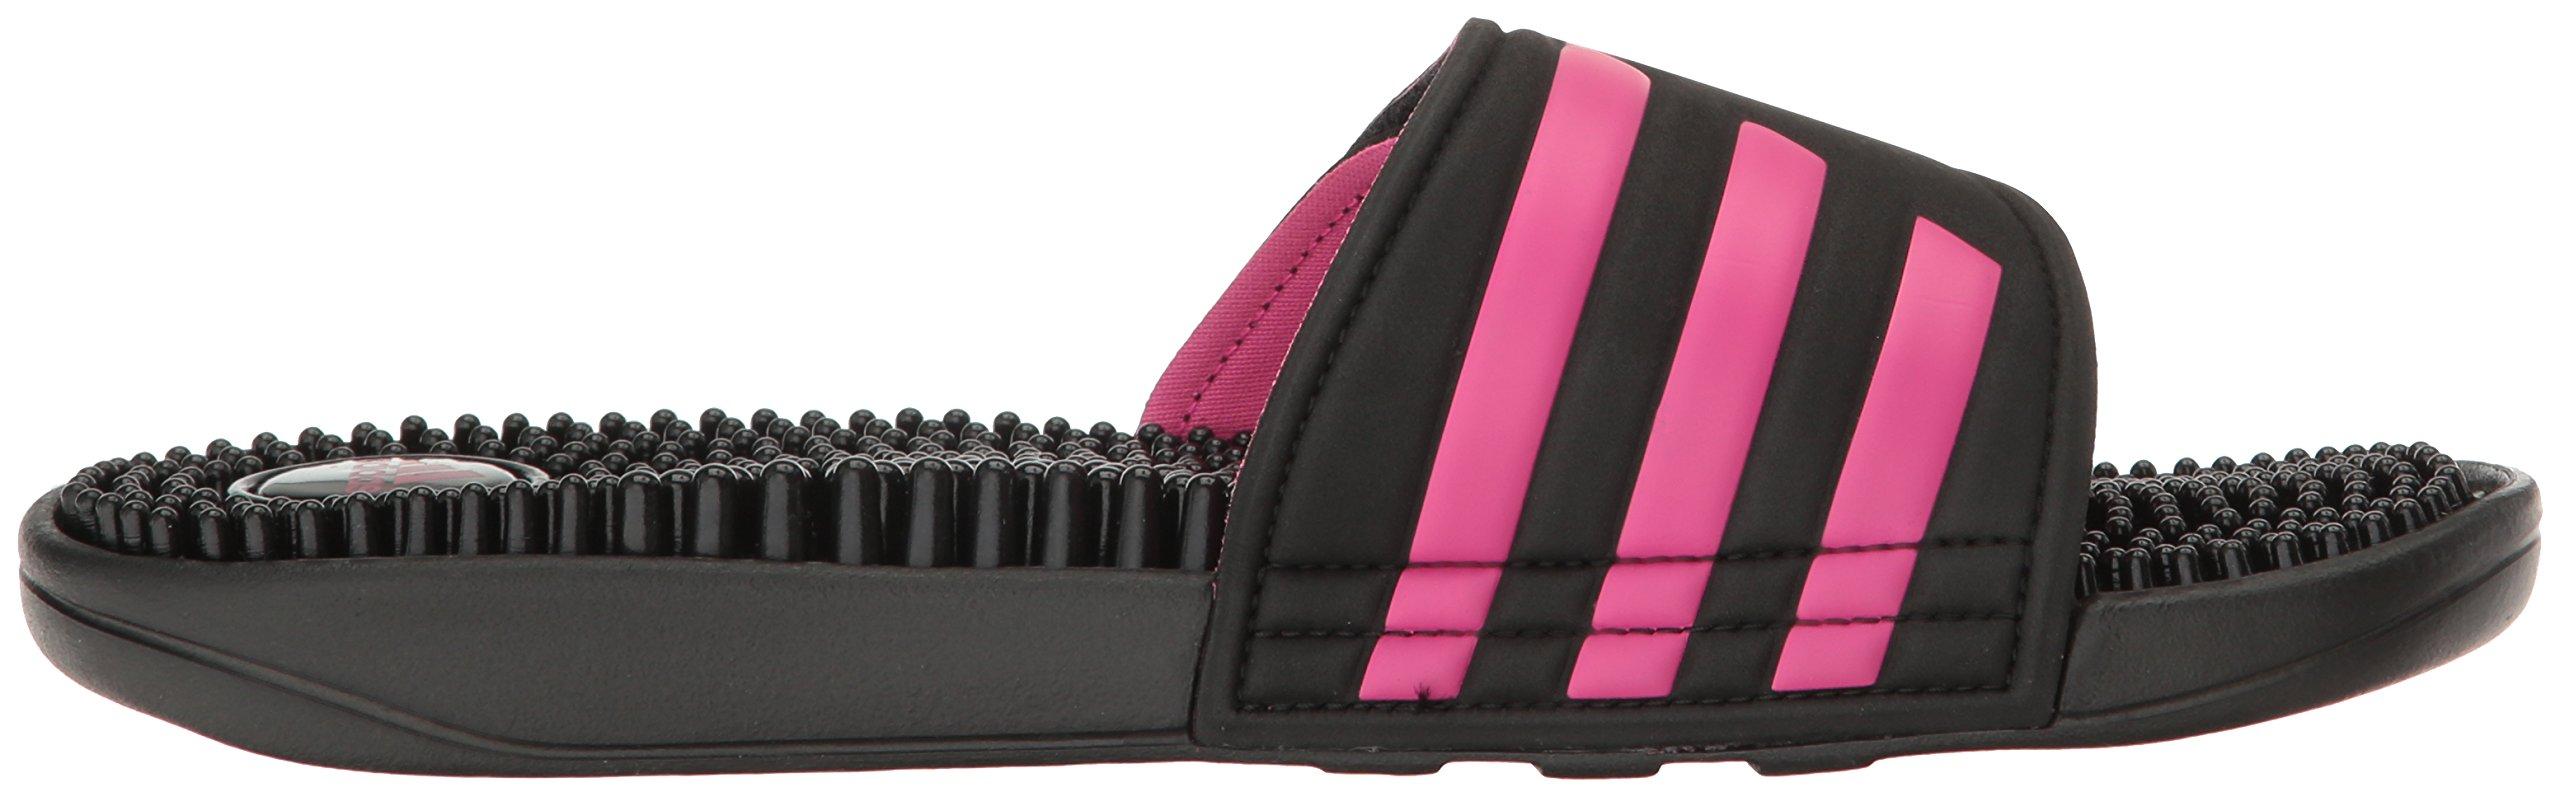 Adidas femminili scarpe adissage slide sandali, nero / la notte.